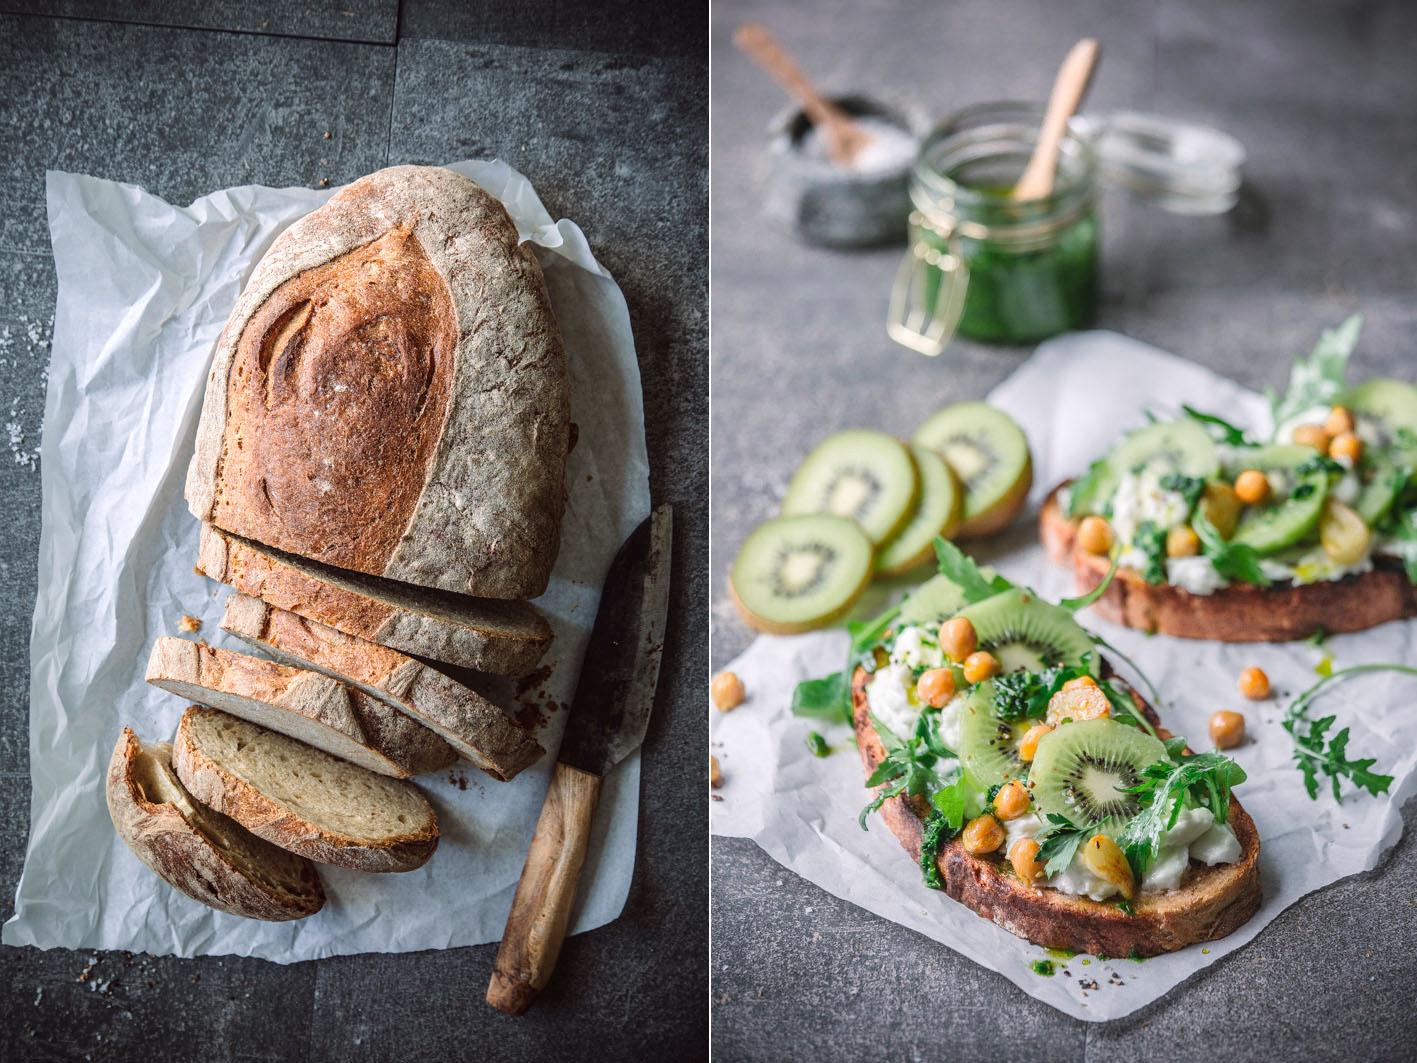 Tartine mit Kiwi und Mozzarella